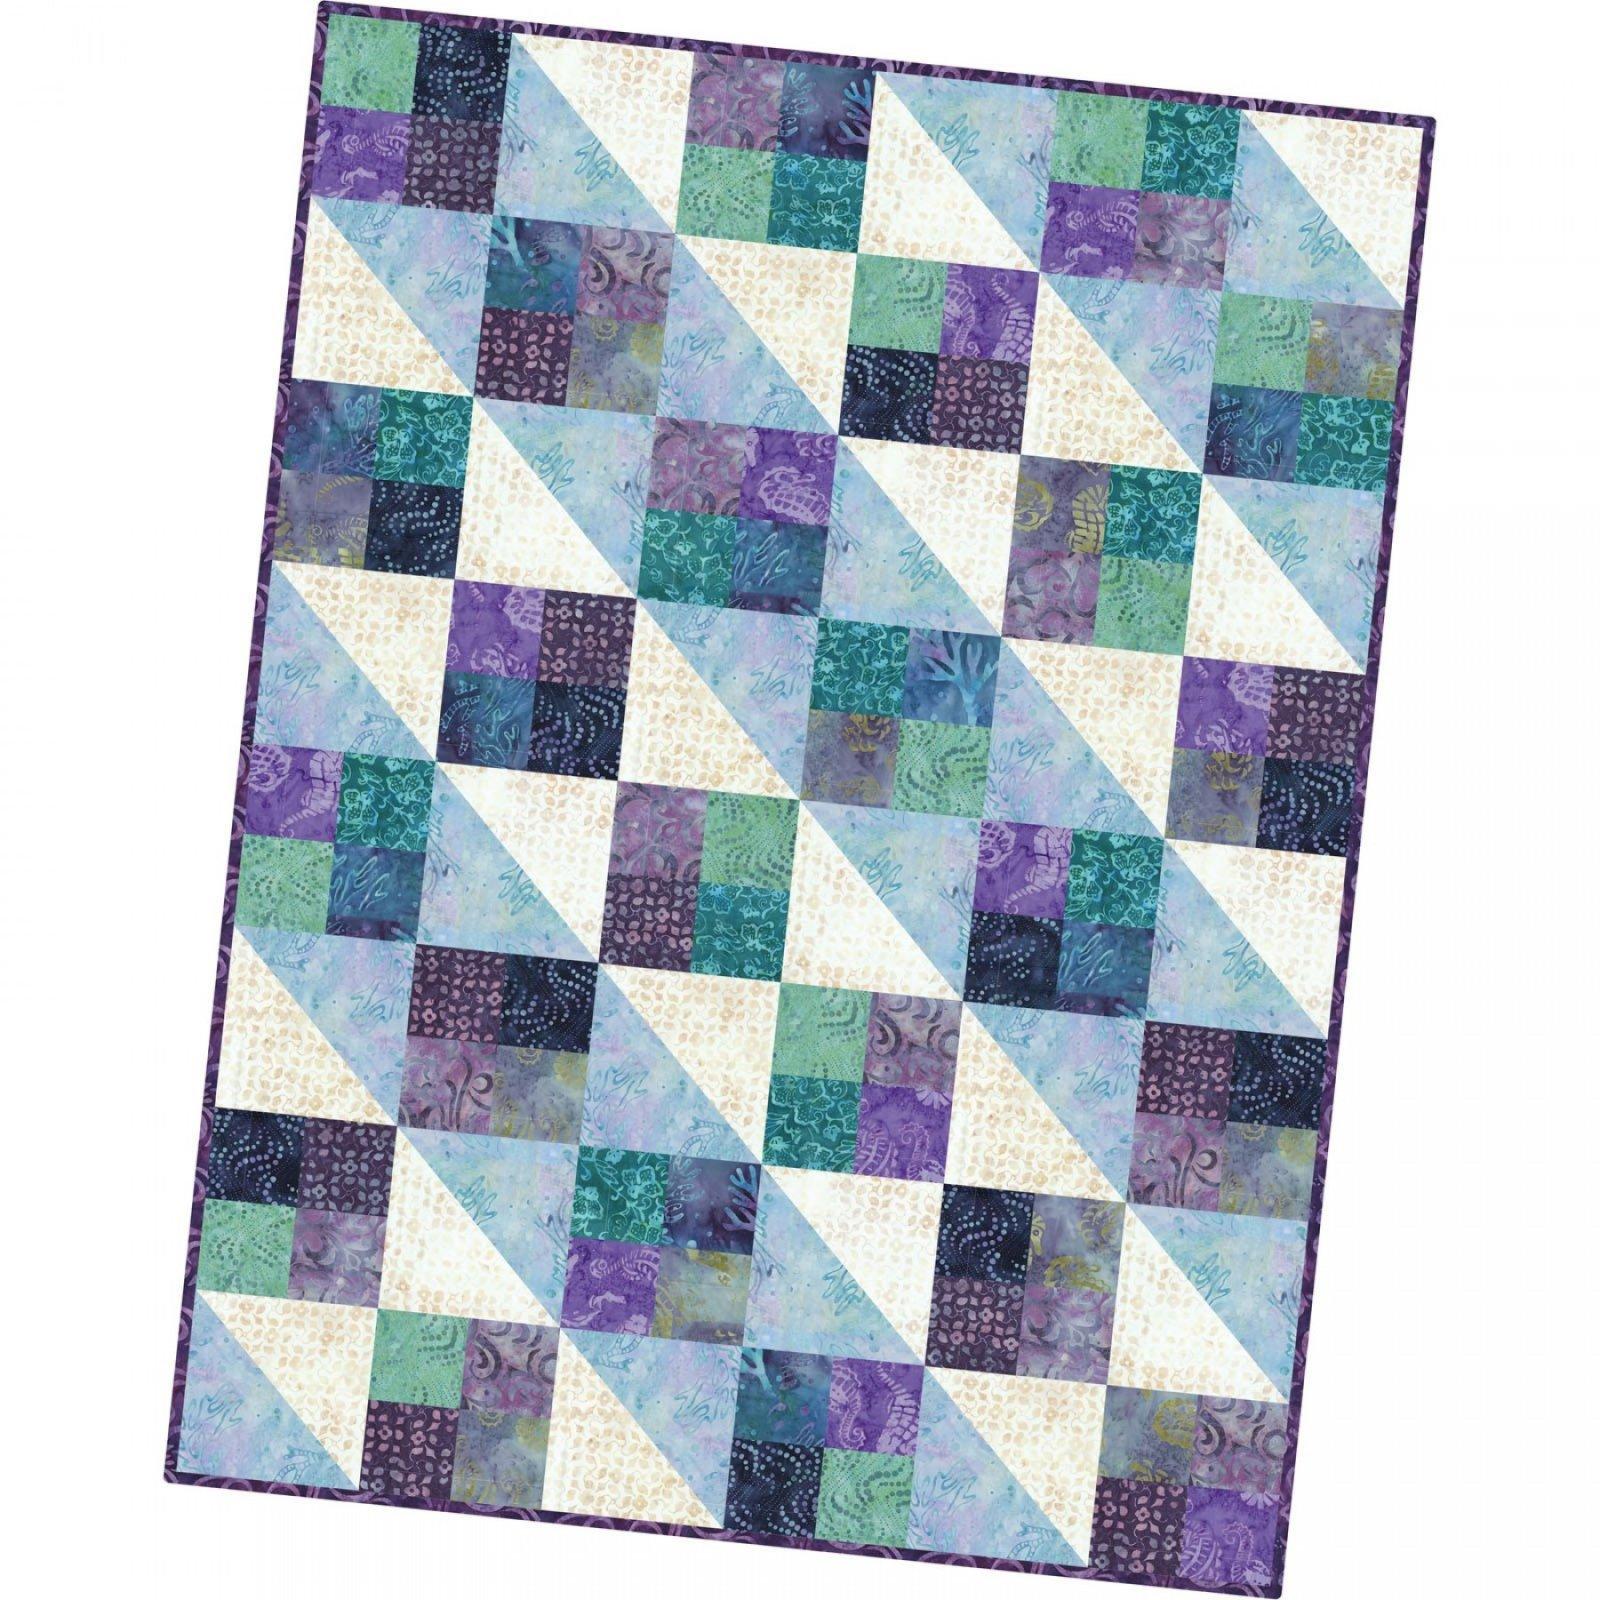 Coastal Chic Batiks Four Square Quilt Kit